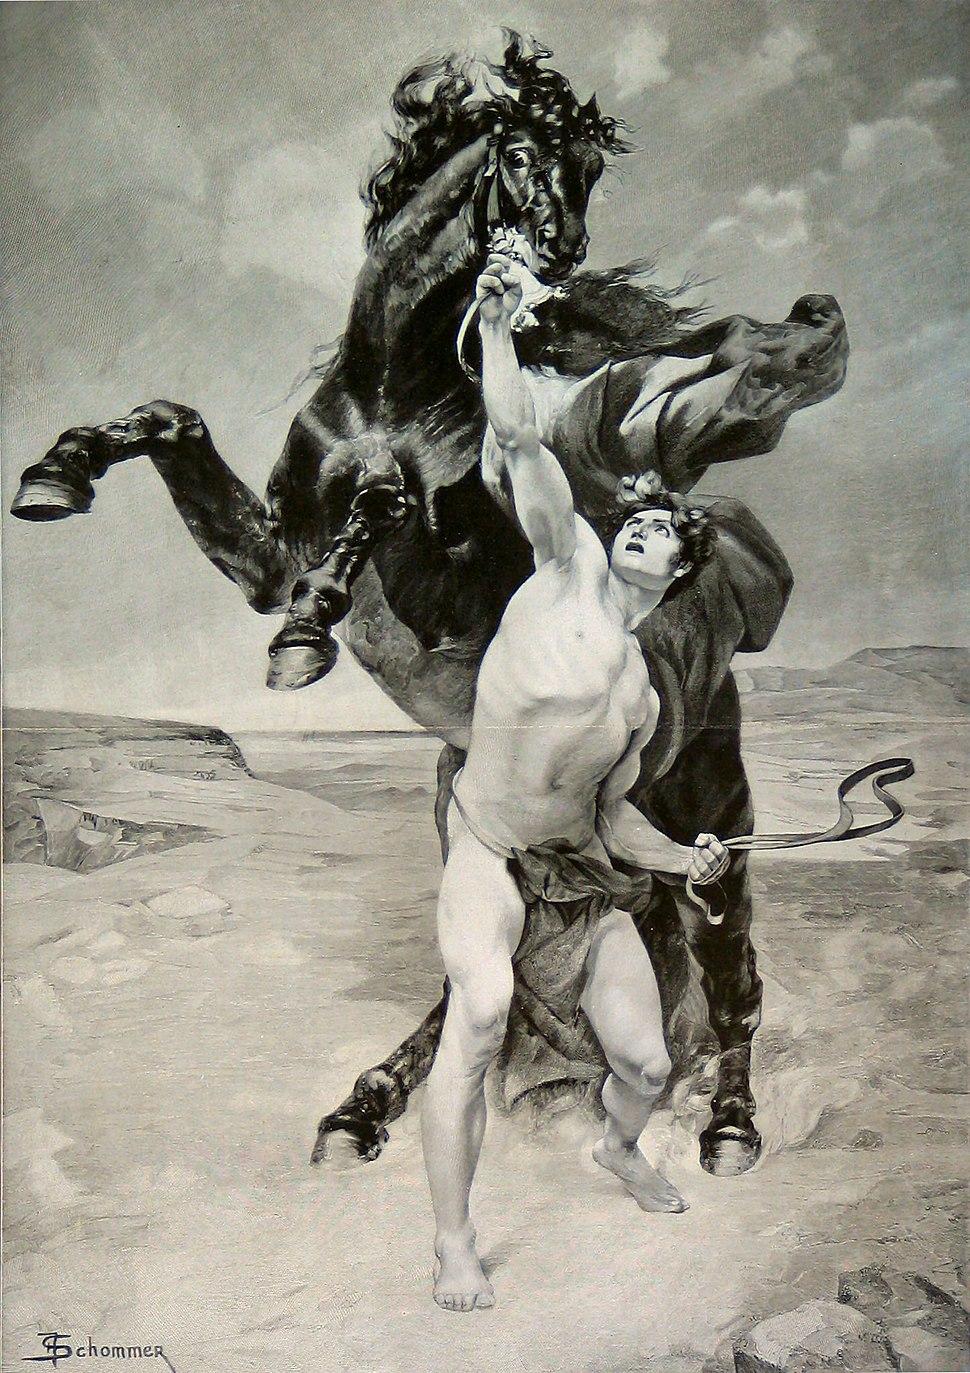 Alexander taming Bucephalus by F. Schommer, German, late 19th century